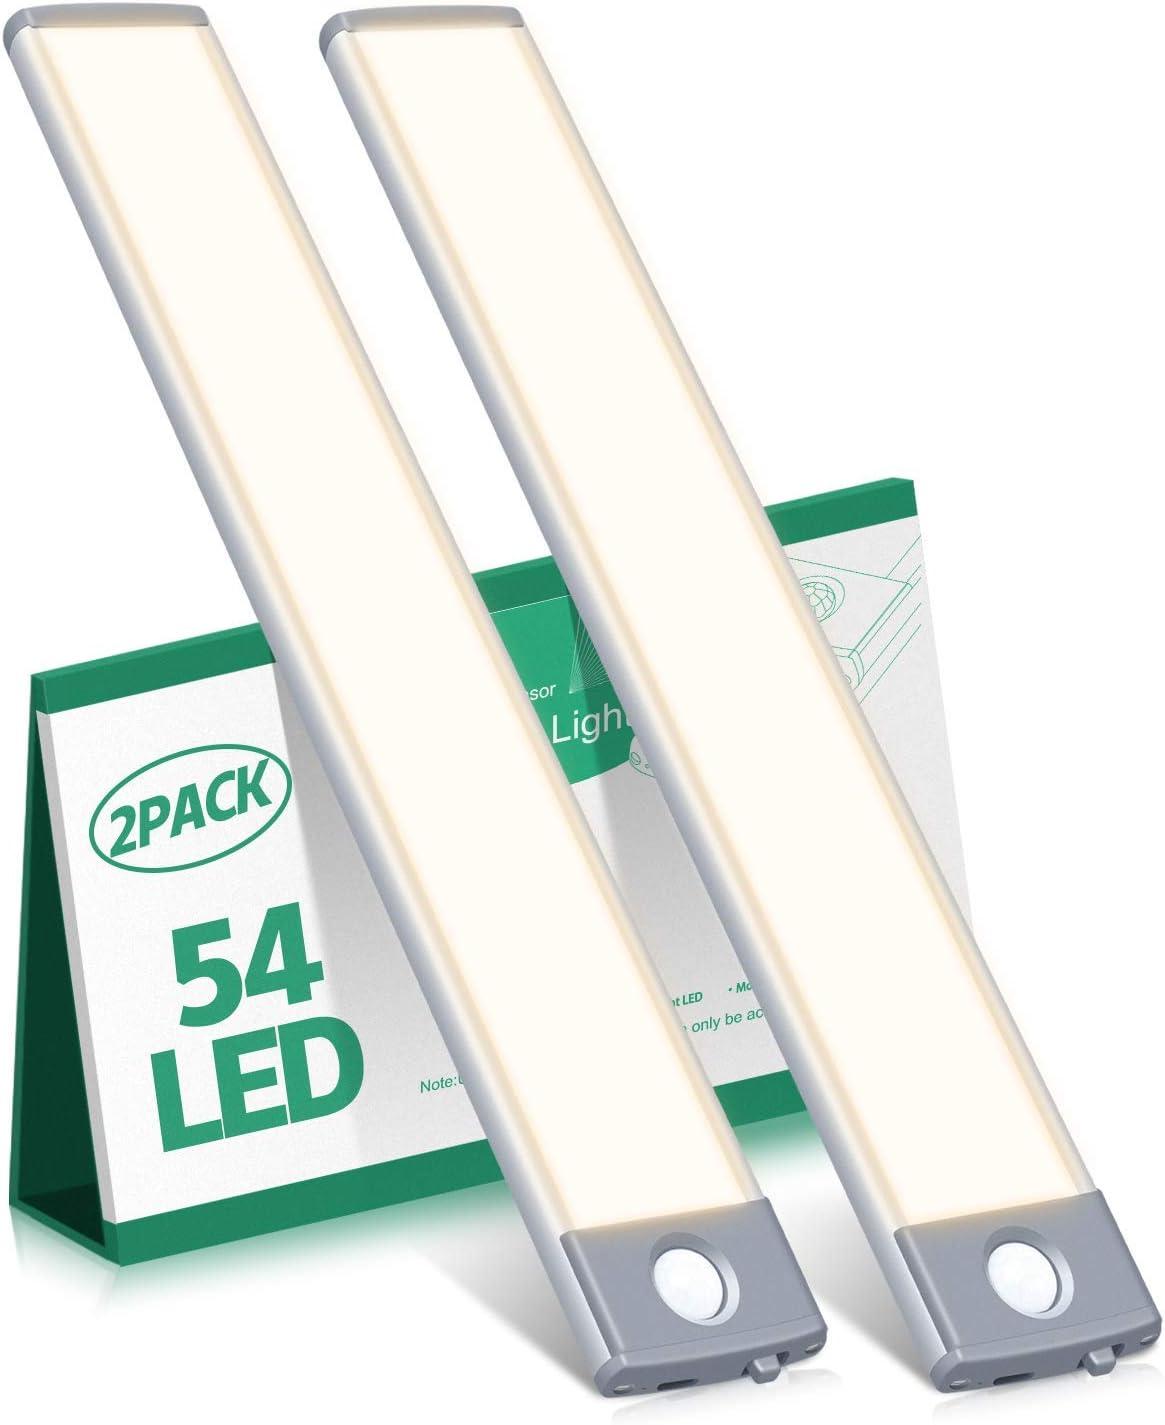 Motion Sensor Cabinet Light 2500mAh 2 Packs Rechargeable 54LED U